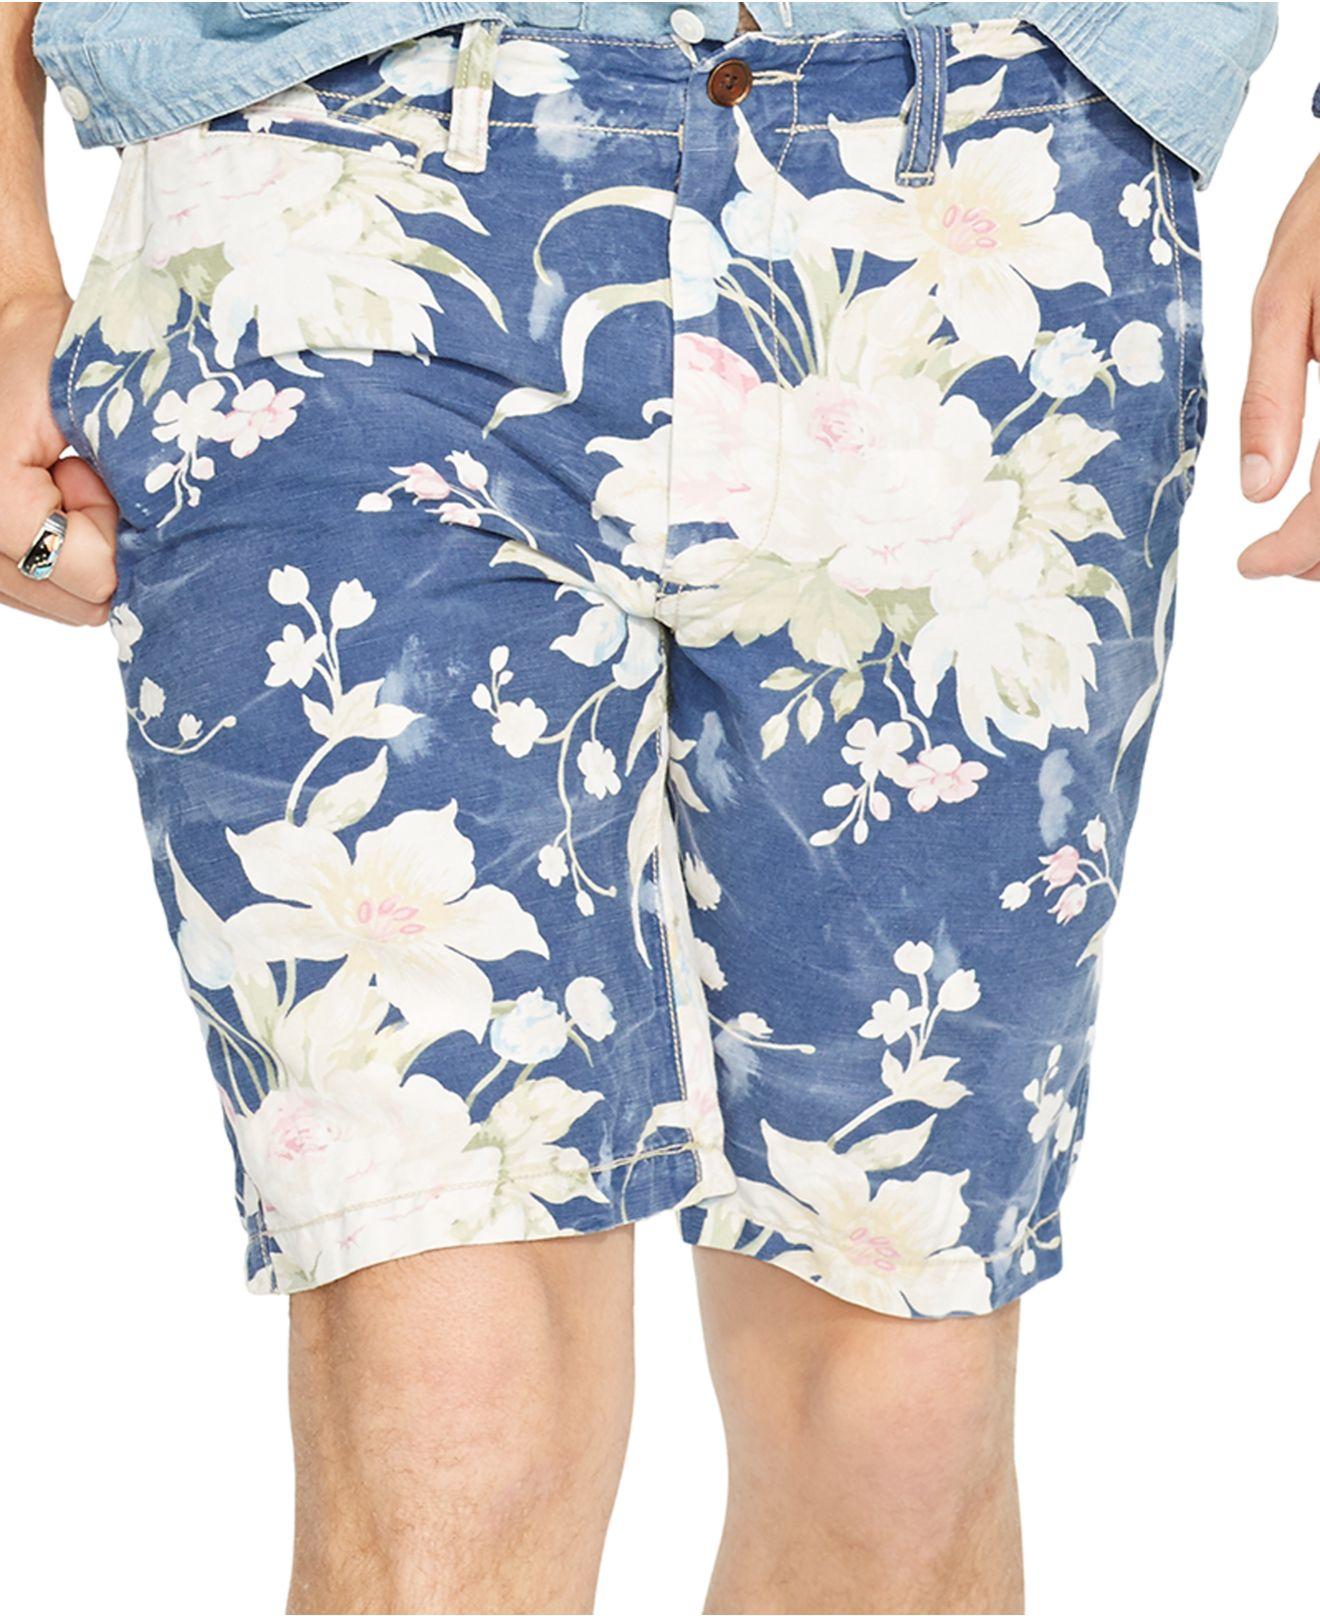 33b3a7d8bc98 Lyst - Polo Ralph Lauren Straight-fit Floral Maritime Short for Men